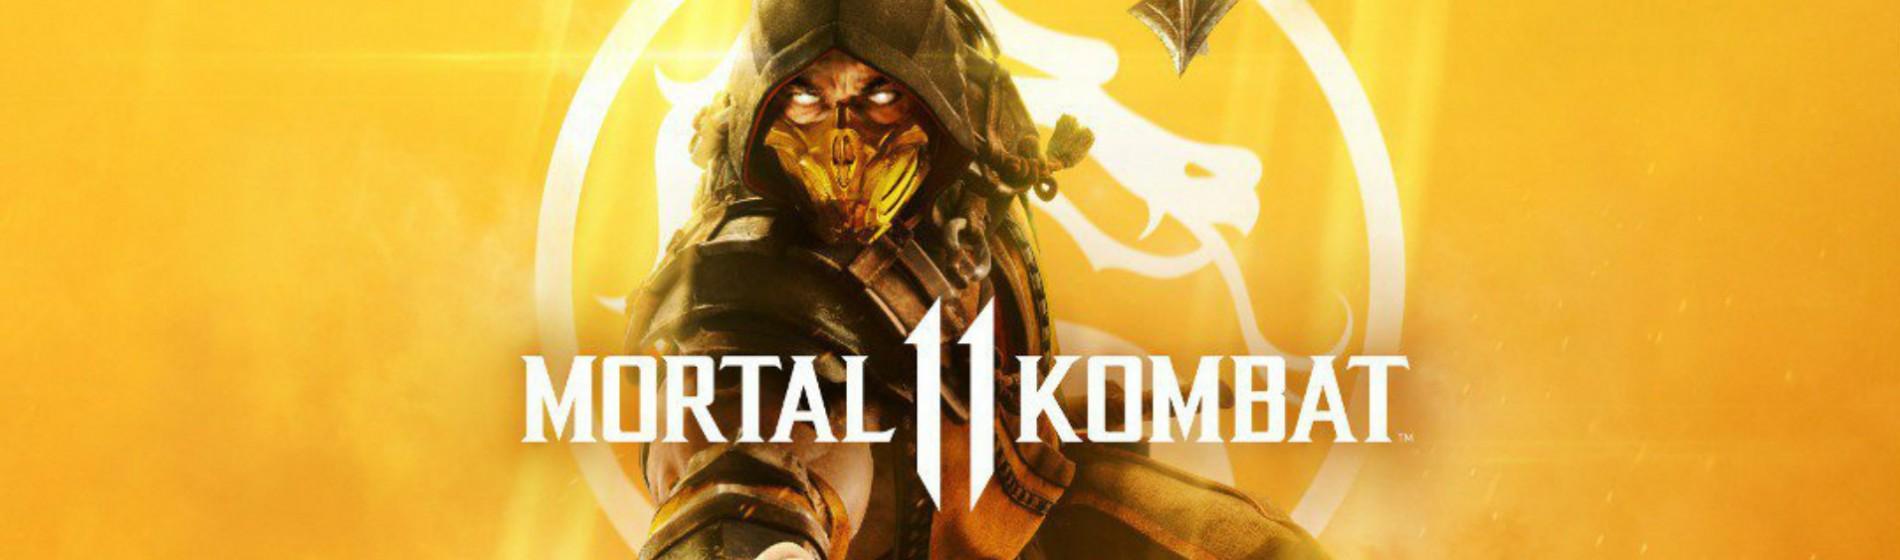 Mortal-Kombat-11-Scorpion-poster